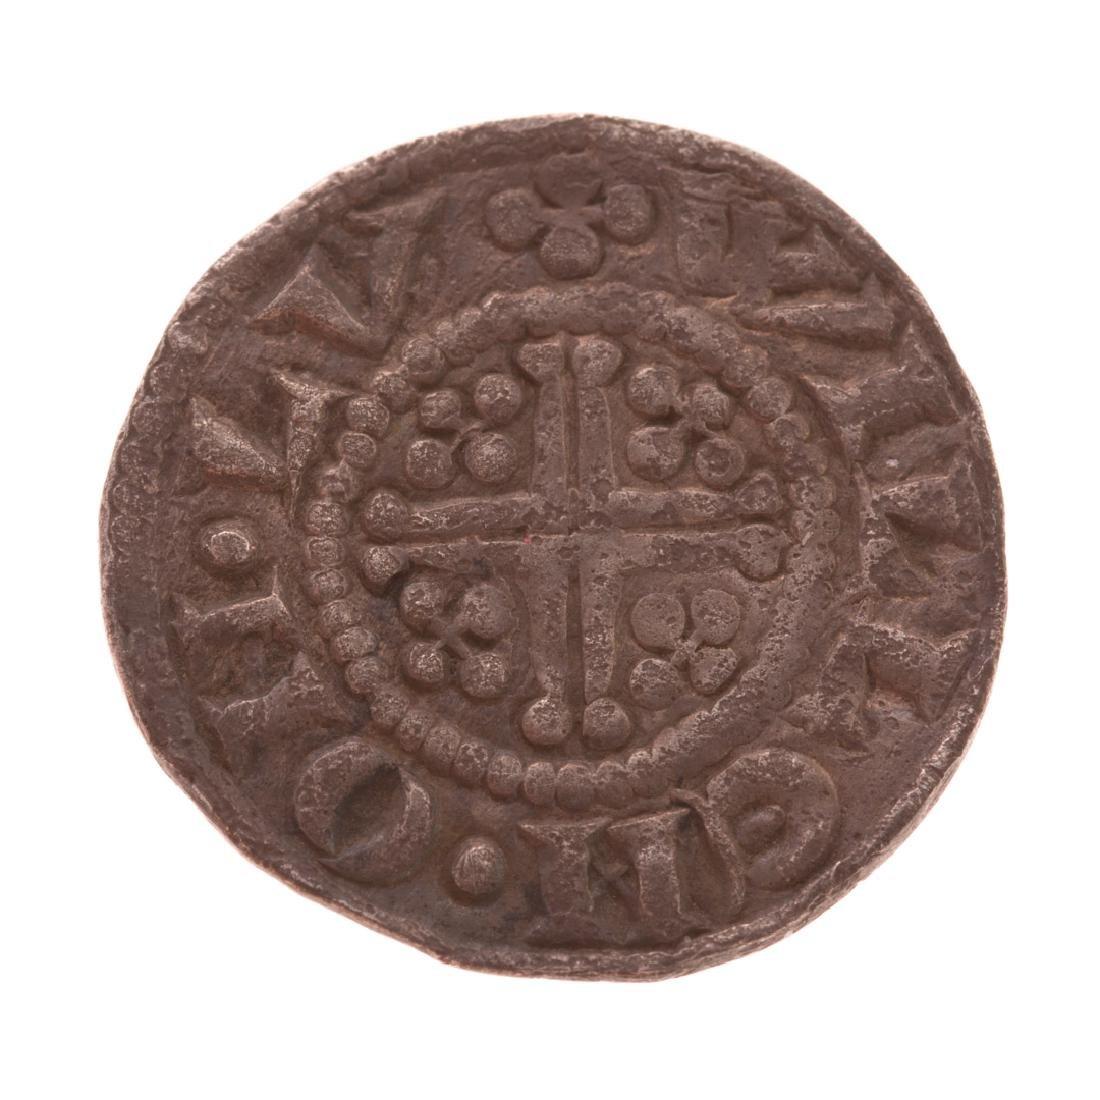 [World] Richard I Short Cross Penny (1189-1199) - 2